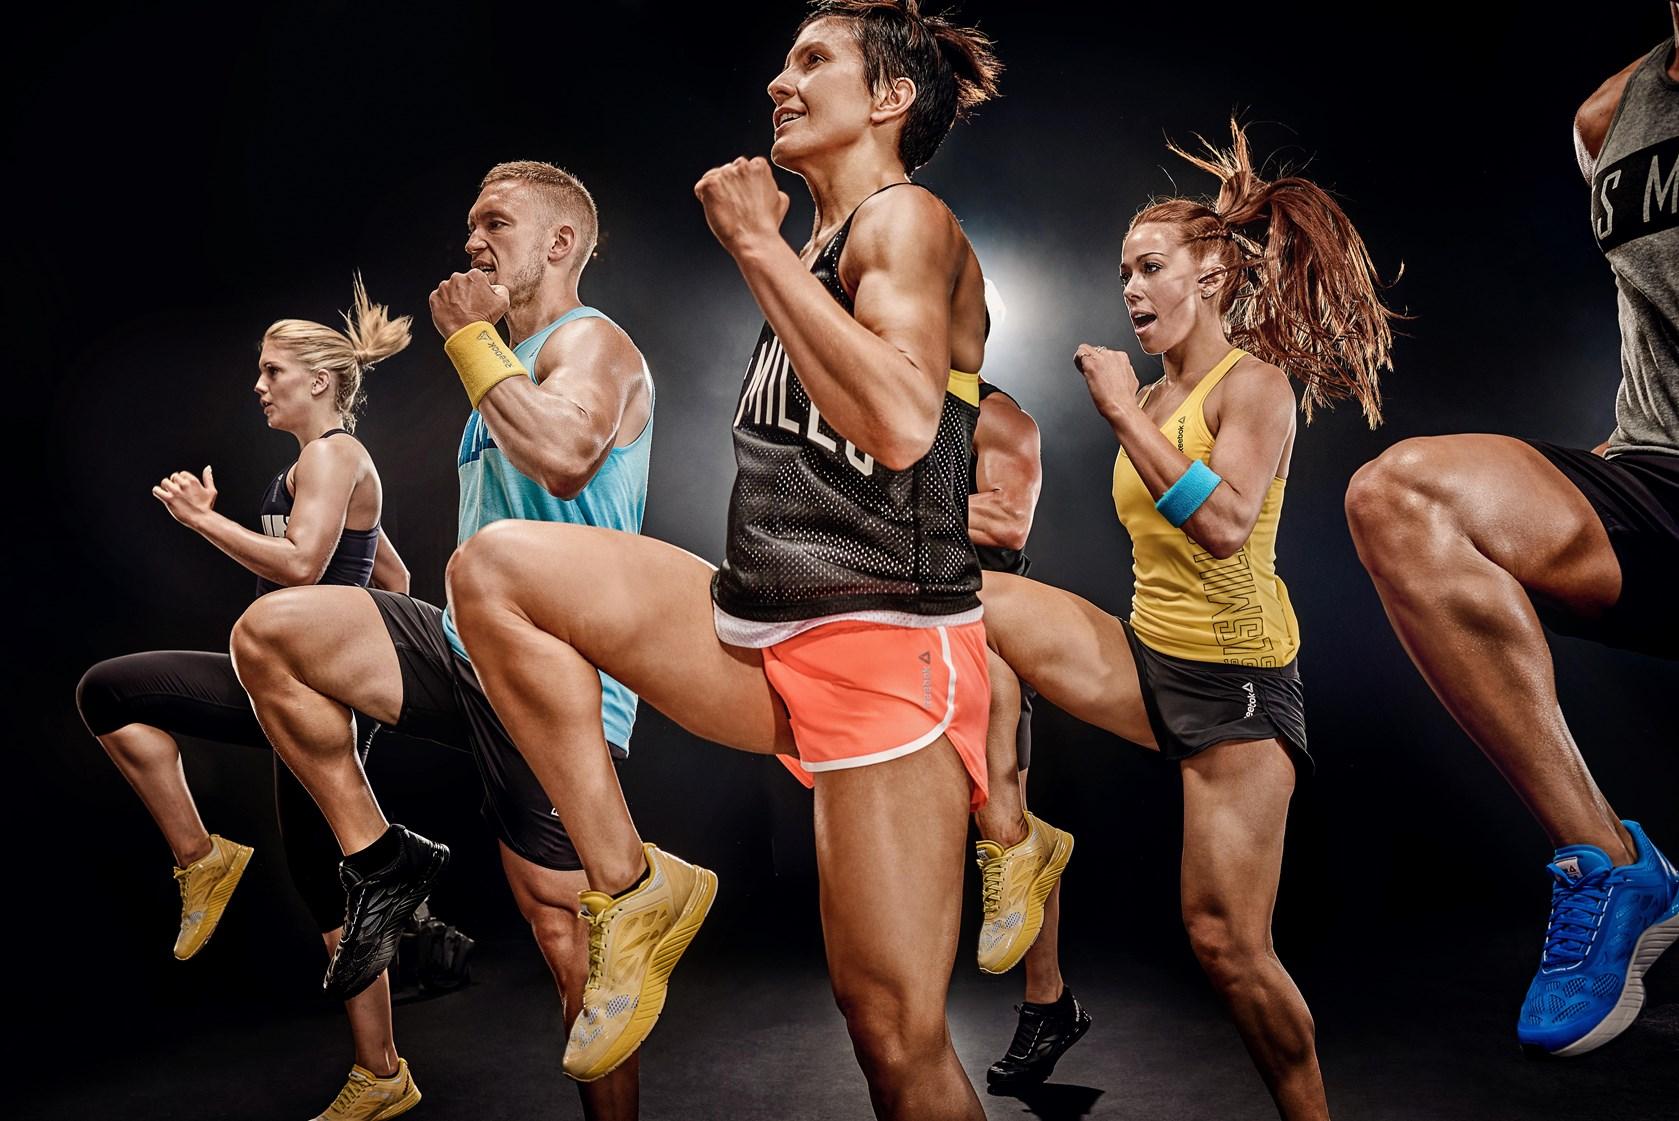 LES MILLS BODYCOMBAT_vitality_fitness_health_body_bodybulding_arnold_club_landgraaf_landgraaf_triggerz_roy_google_heerlen_geleen_sporten